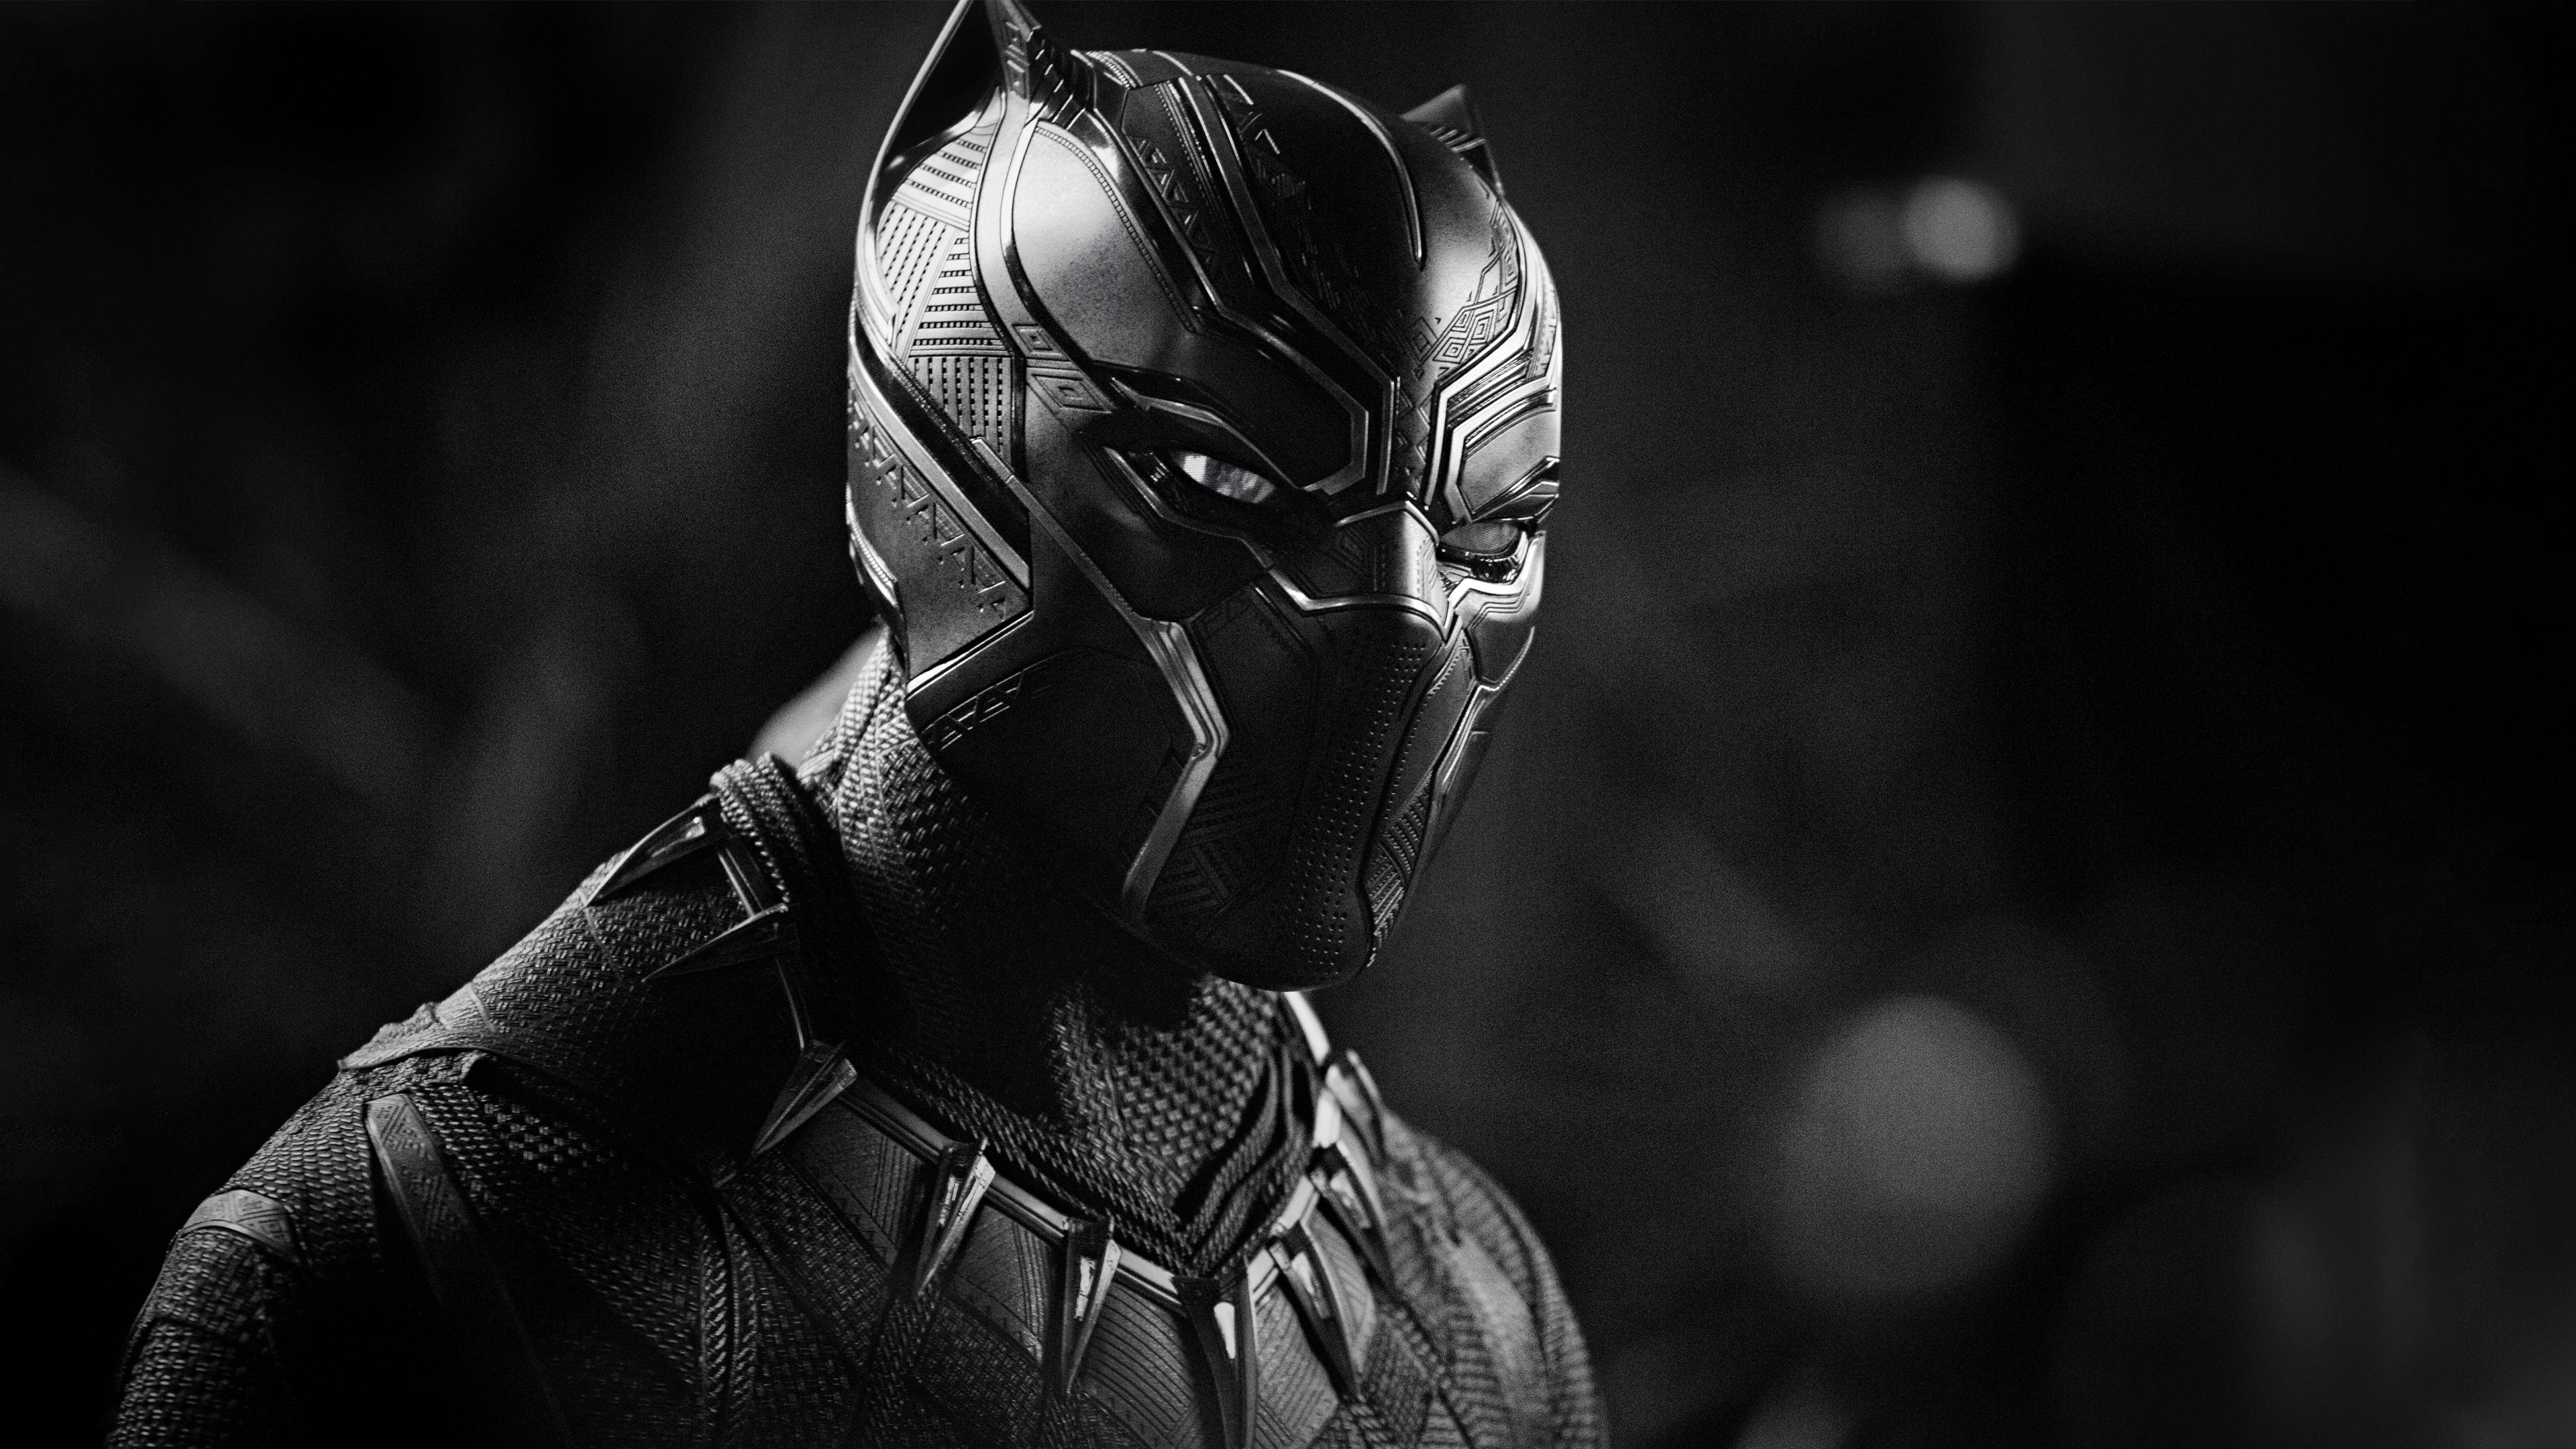 Black Panther 4K Wallpaper enjoy marvelstudios 3840x2160